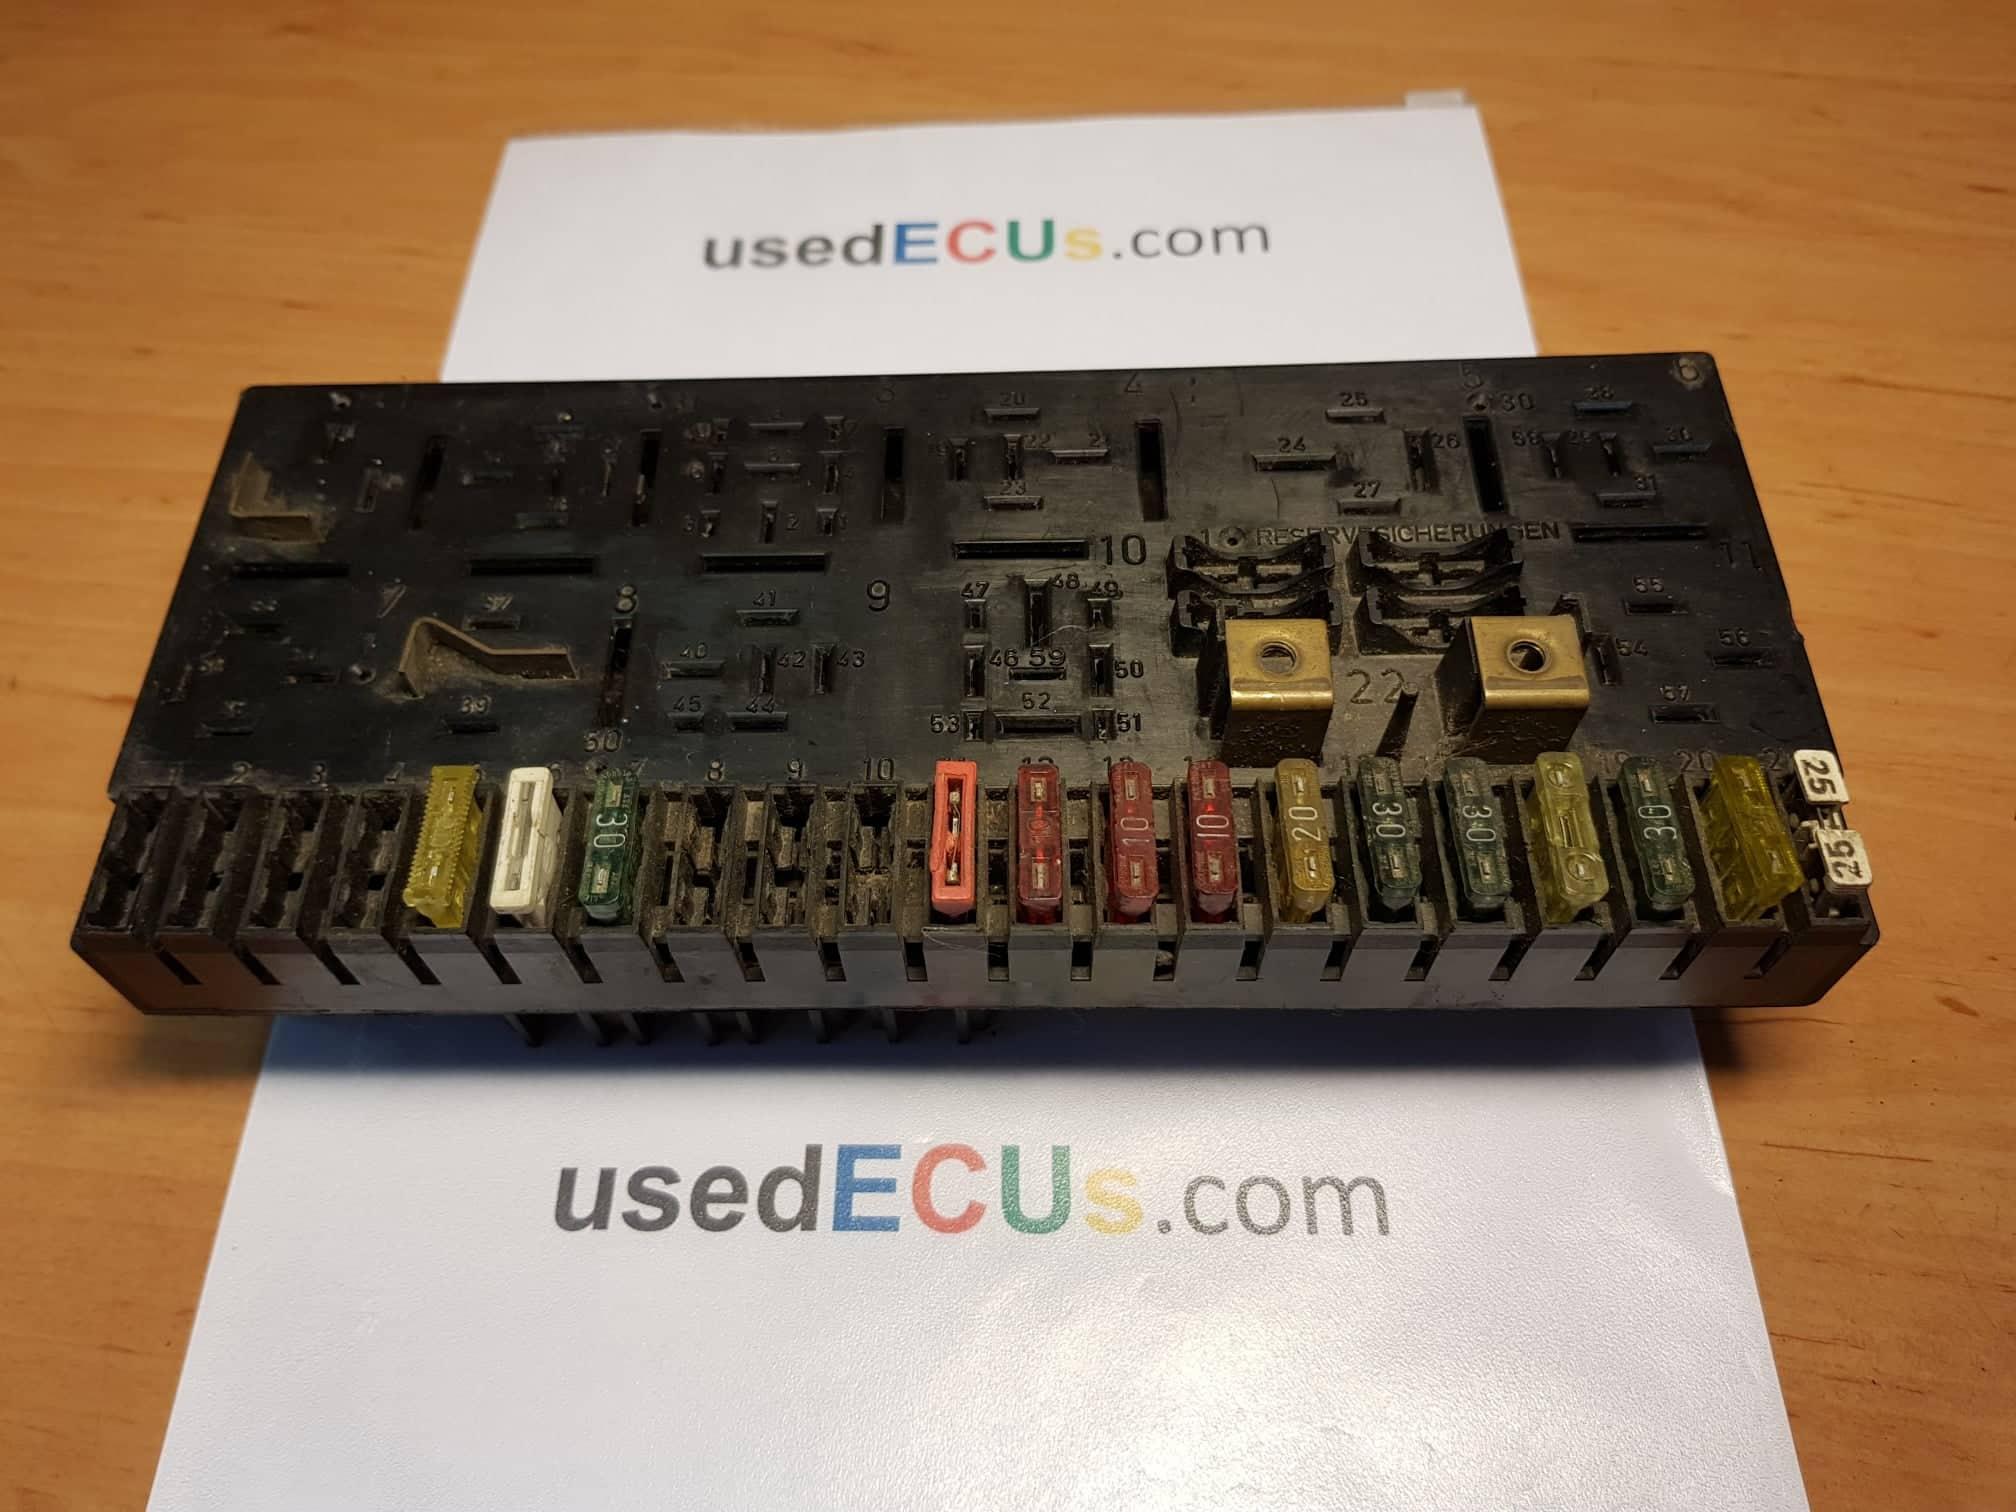 audi 80, 100 fuse box, reservesicherungen - usedecus.com audi 80 fuse box  catalog - usedecus.com